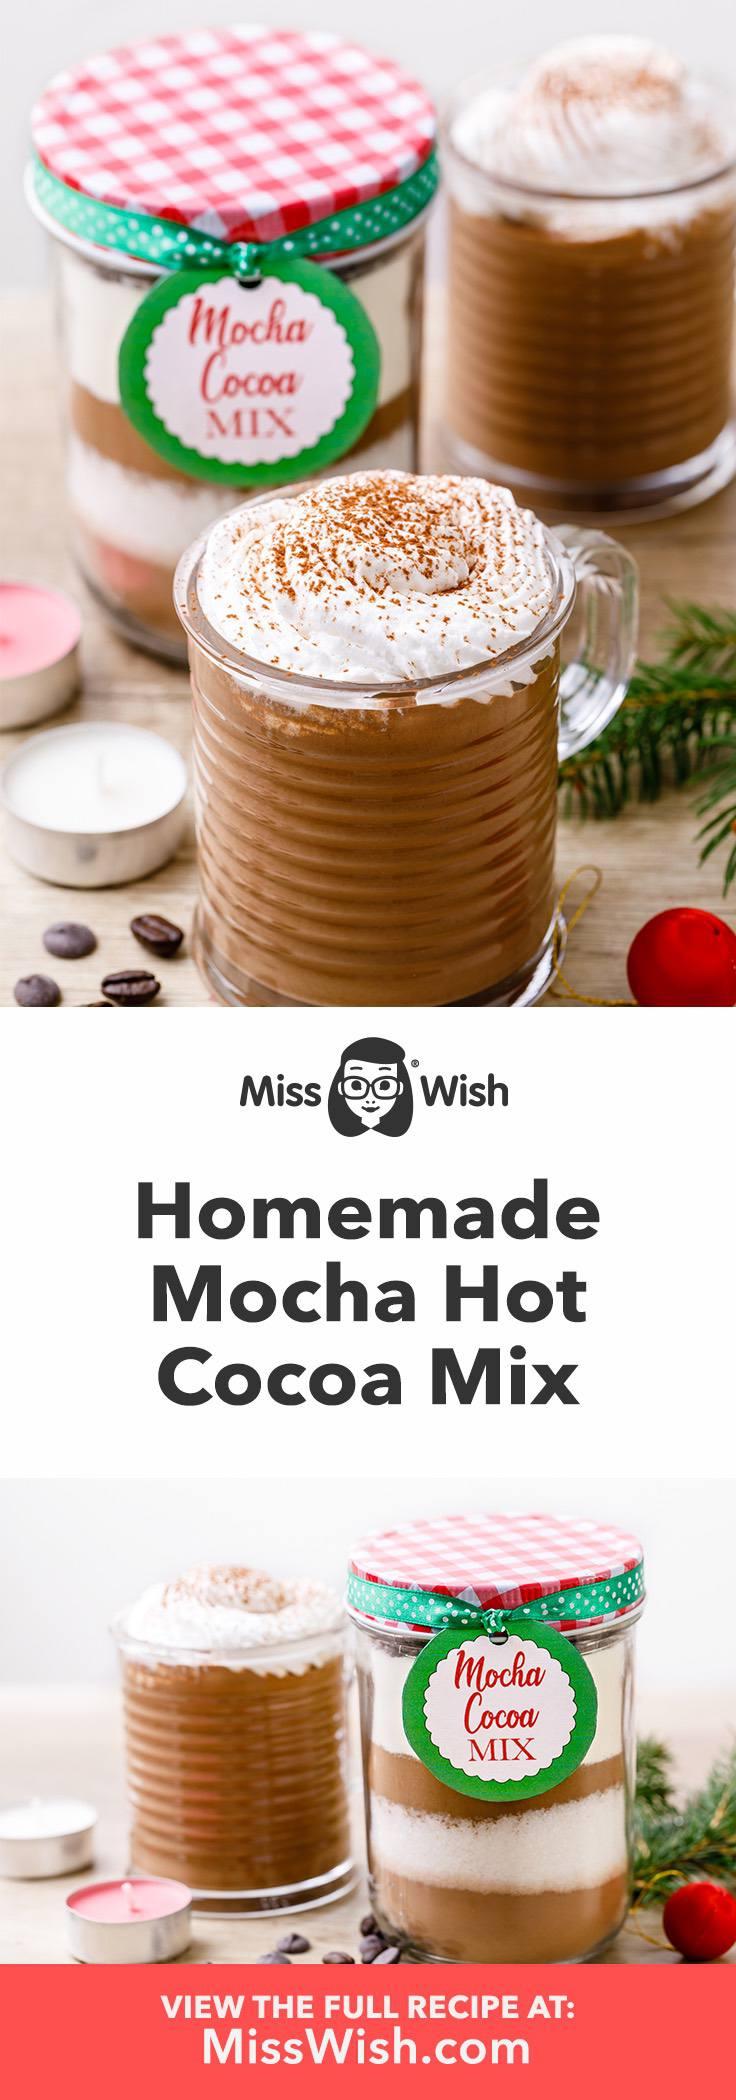 How to make homemade mocha hot cocoa mix.